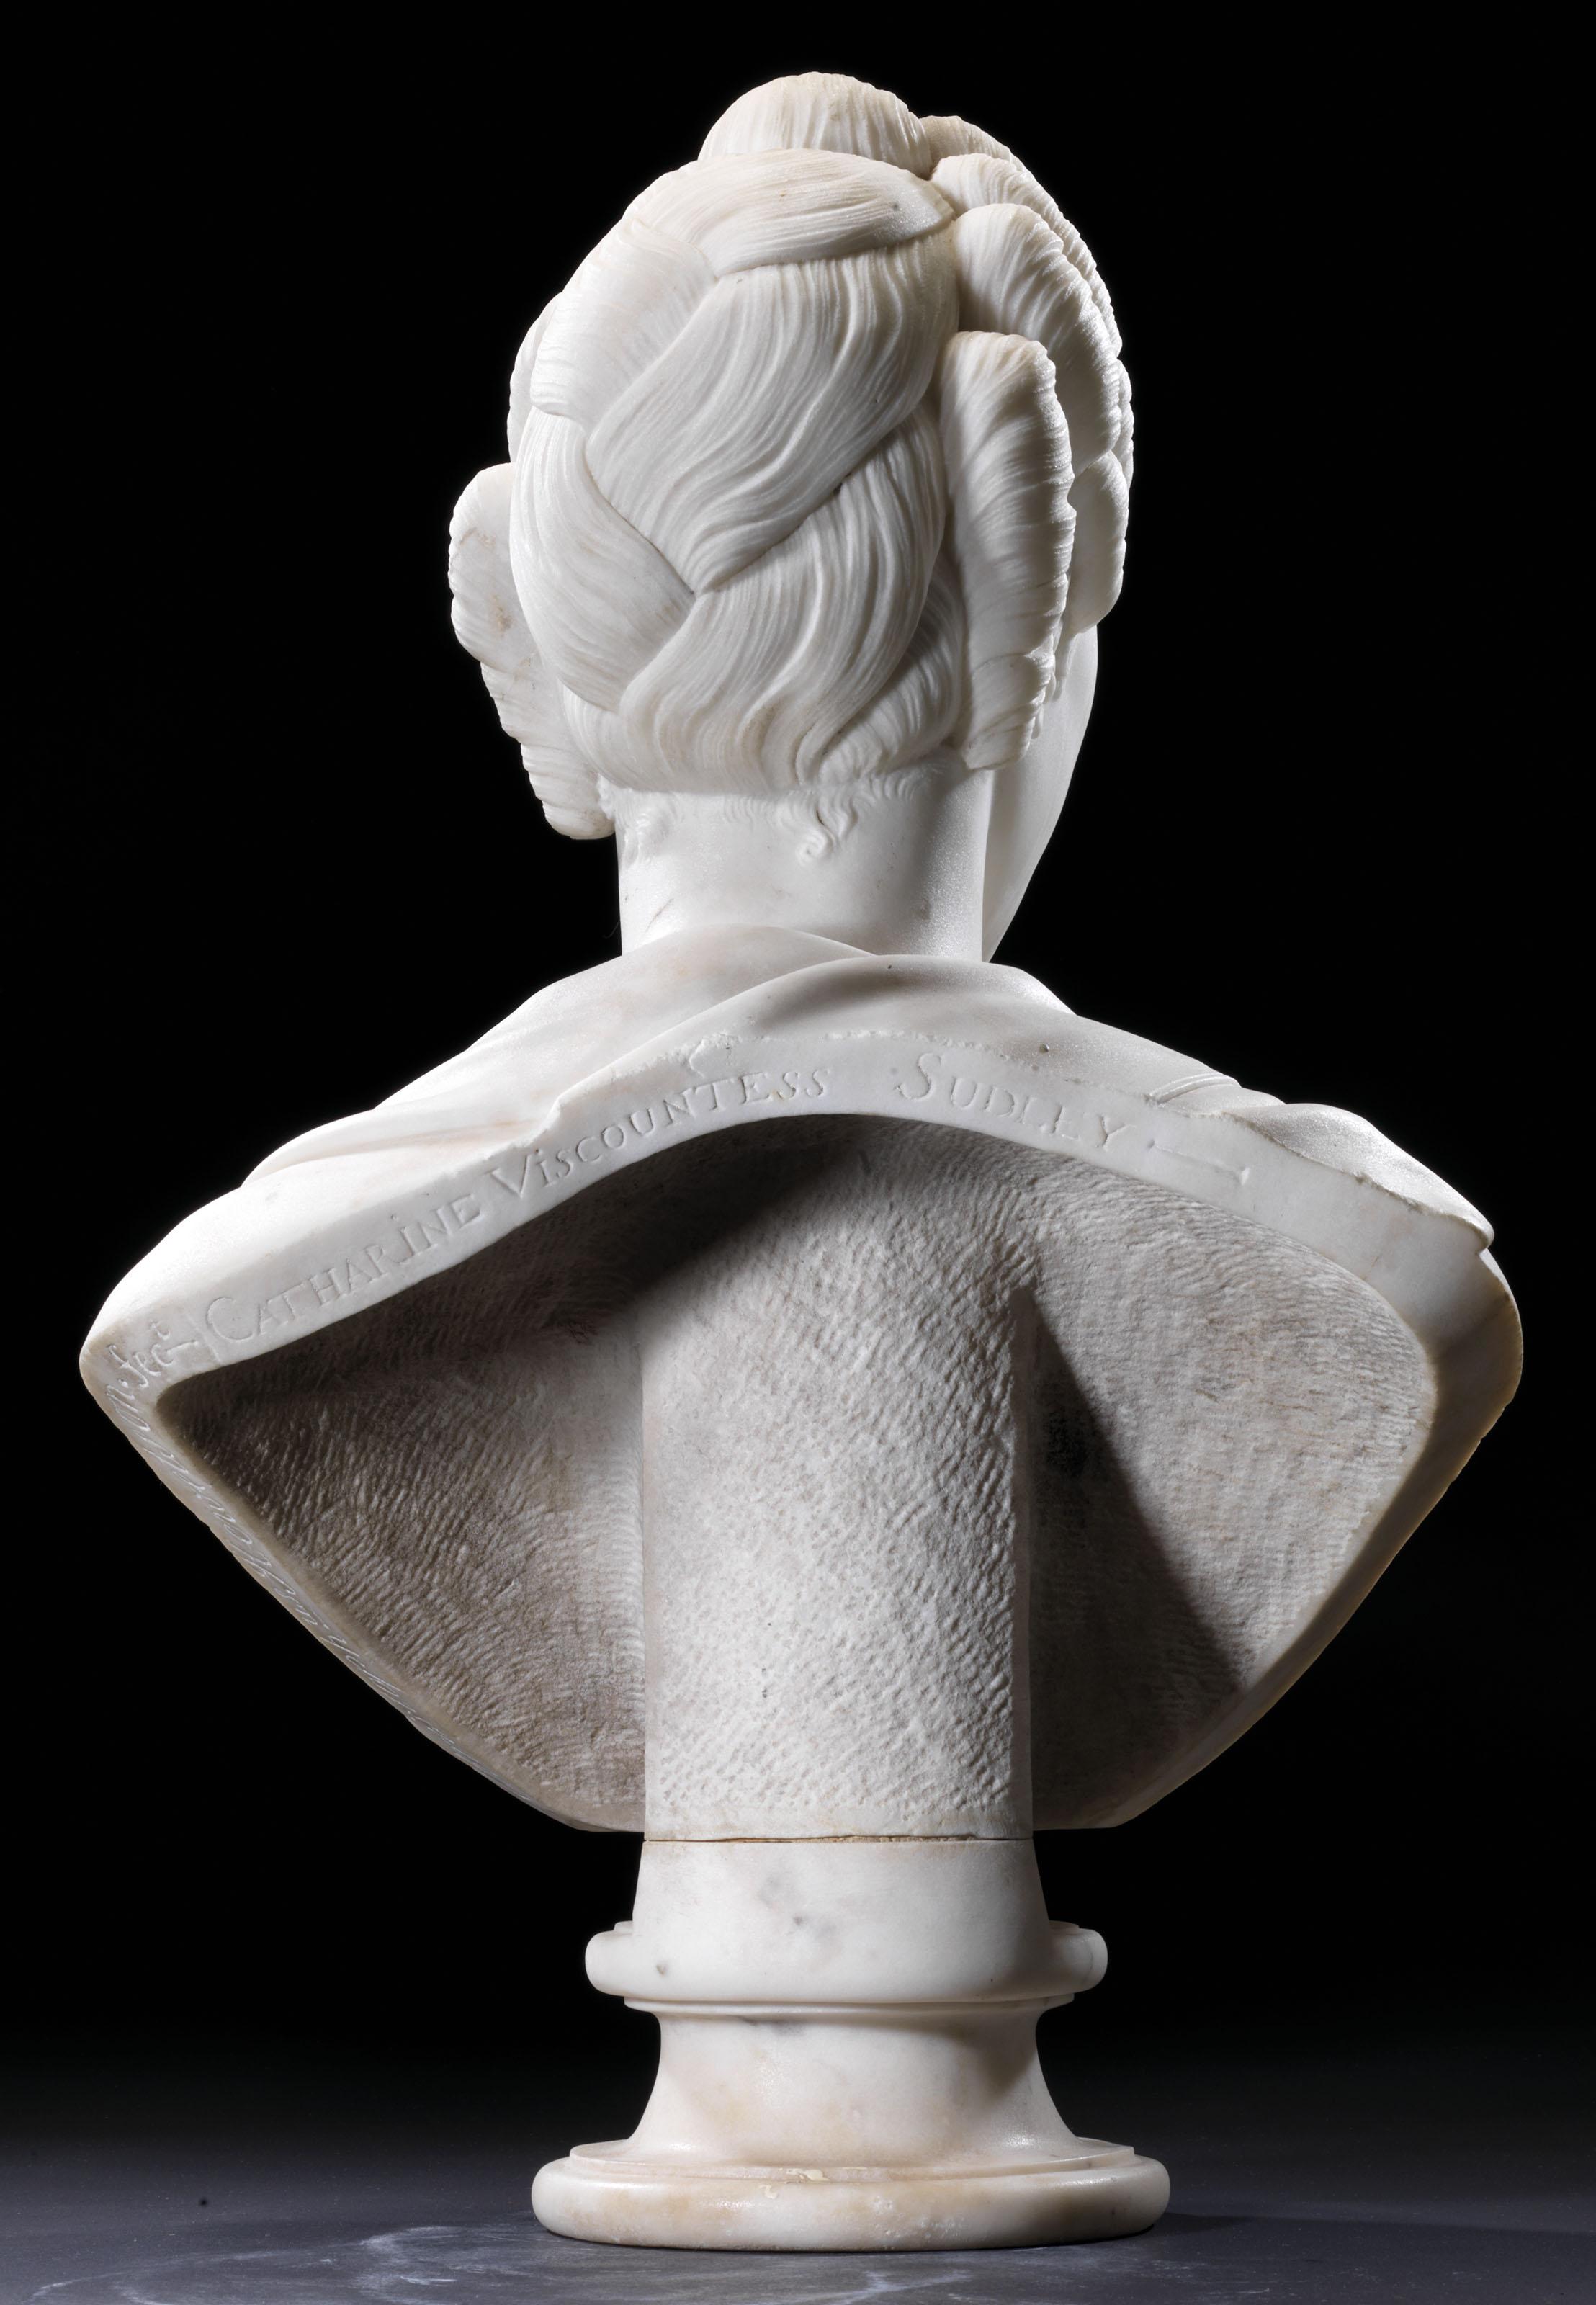 CHRISTOPHER HEWETSON (1737-1799), ROME, CIRCA 1767-9